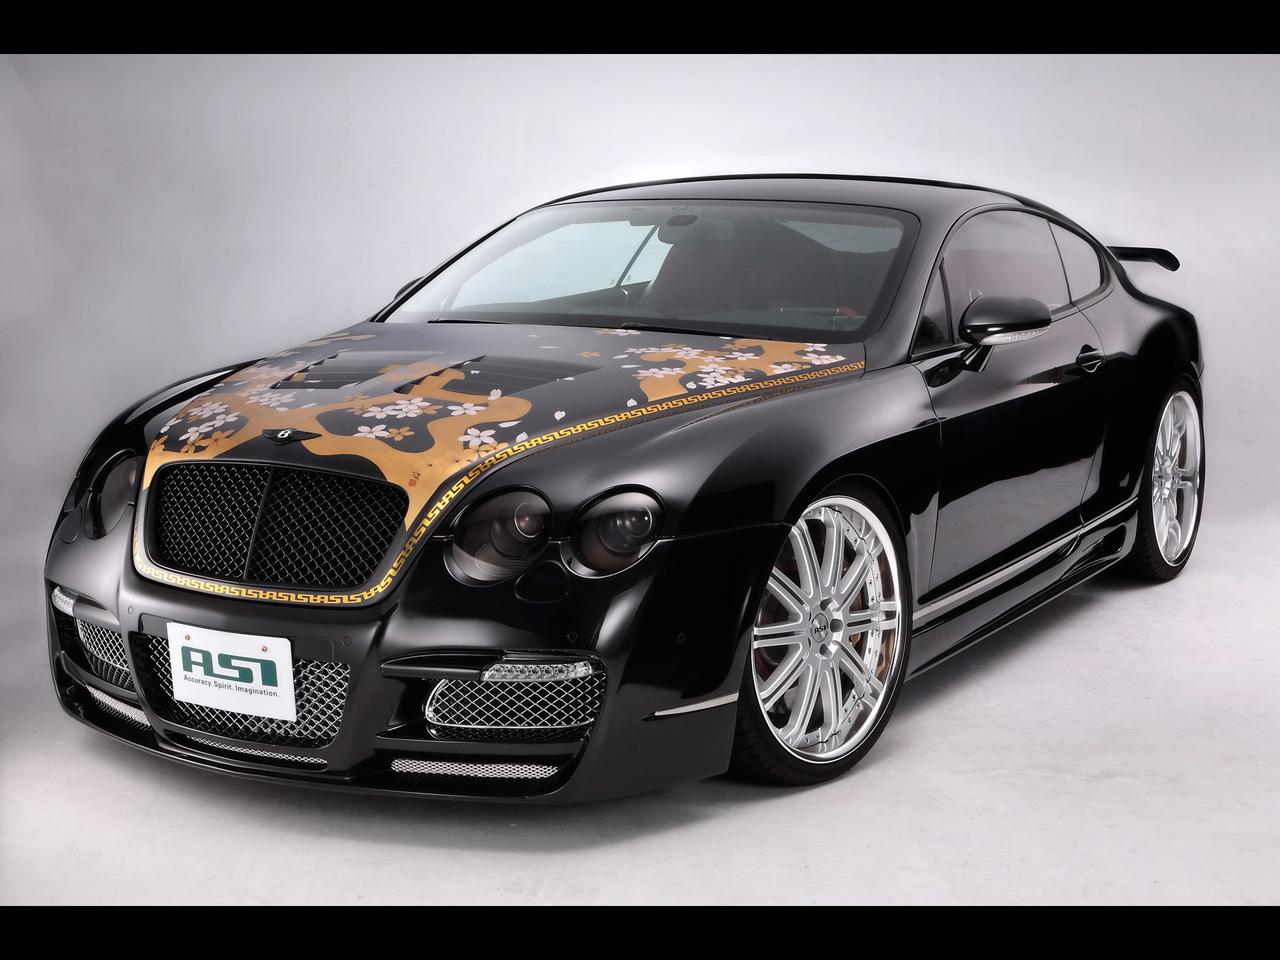 Used Luxury Cars In Amarillo Texas  Street Select Of Amarillo